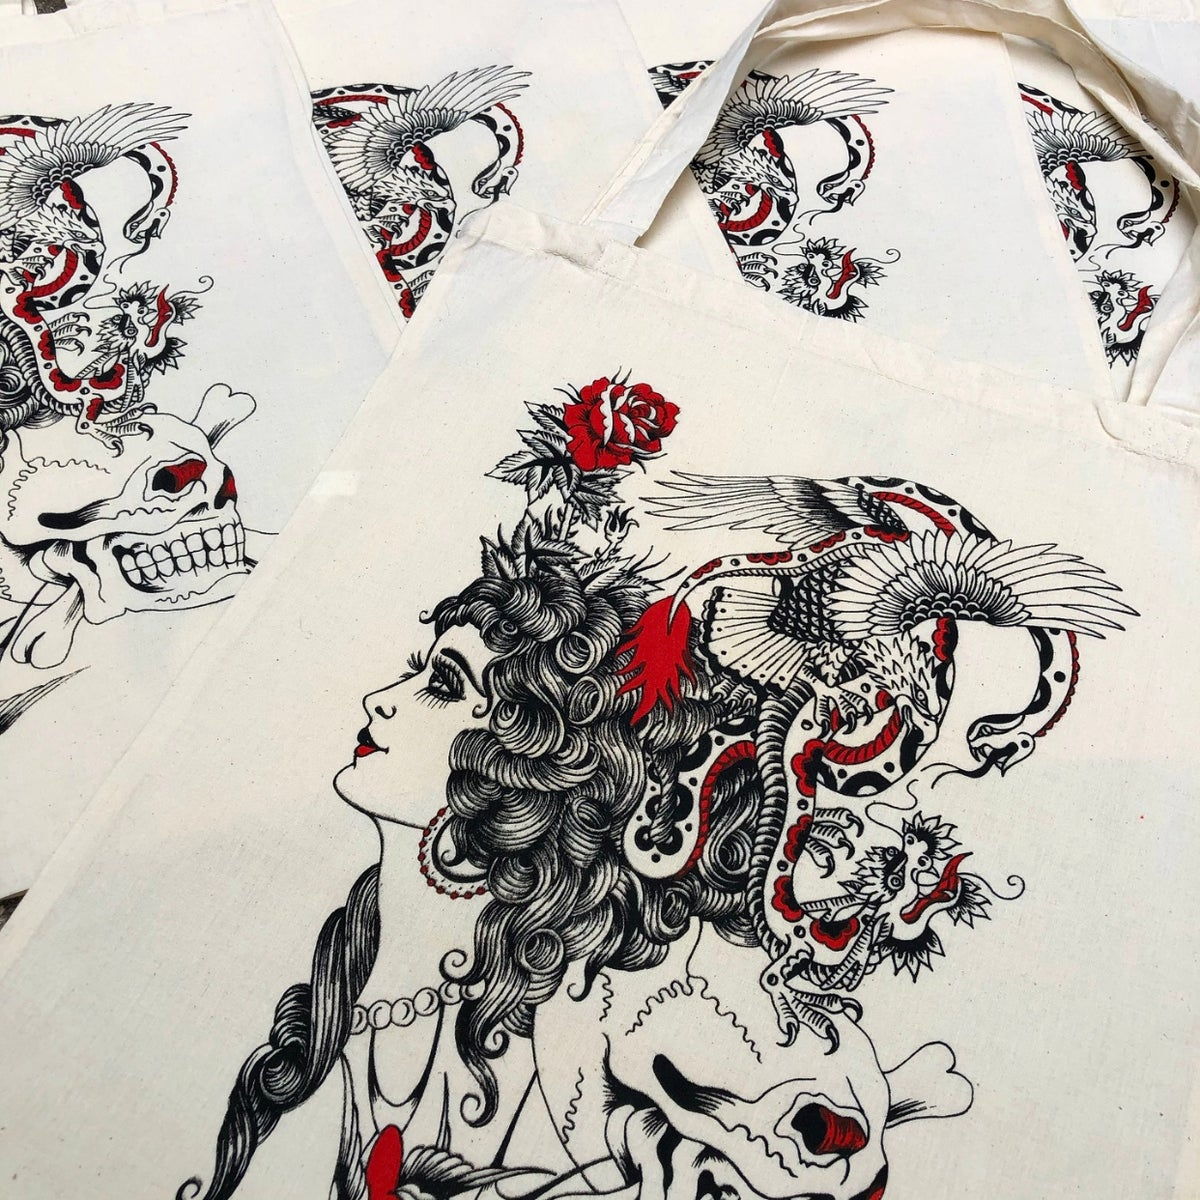 Image of Tat flash canvas tote bag